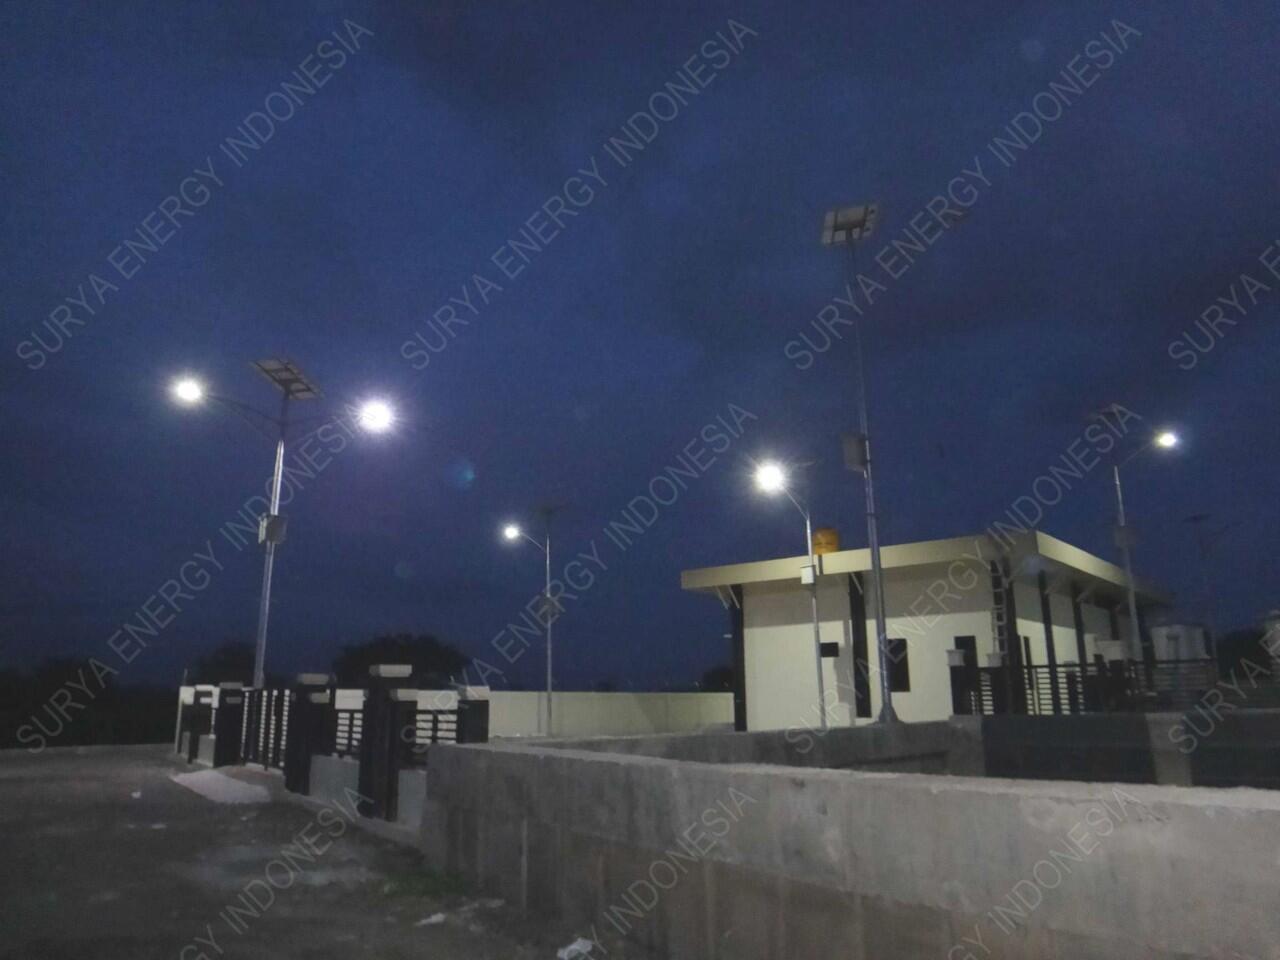 Pabrikasi PJU (Penerangan Jalan Umum) Tenaga Surya